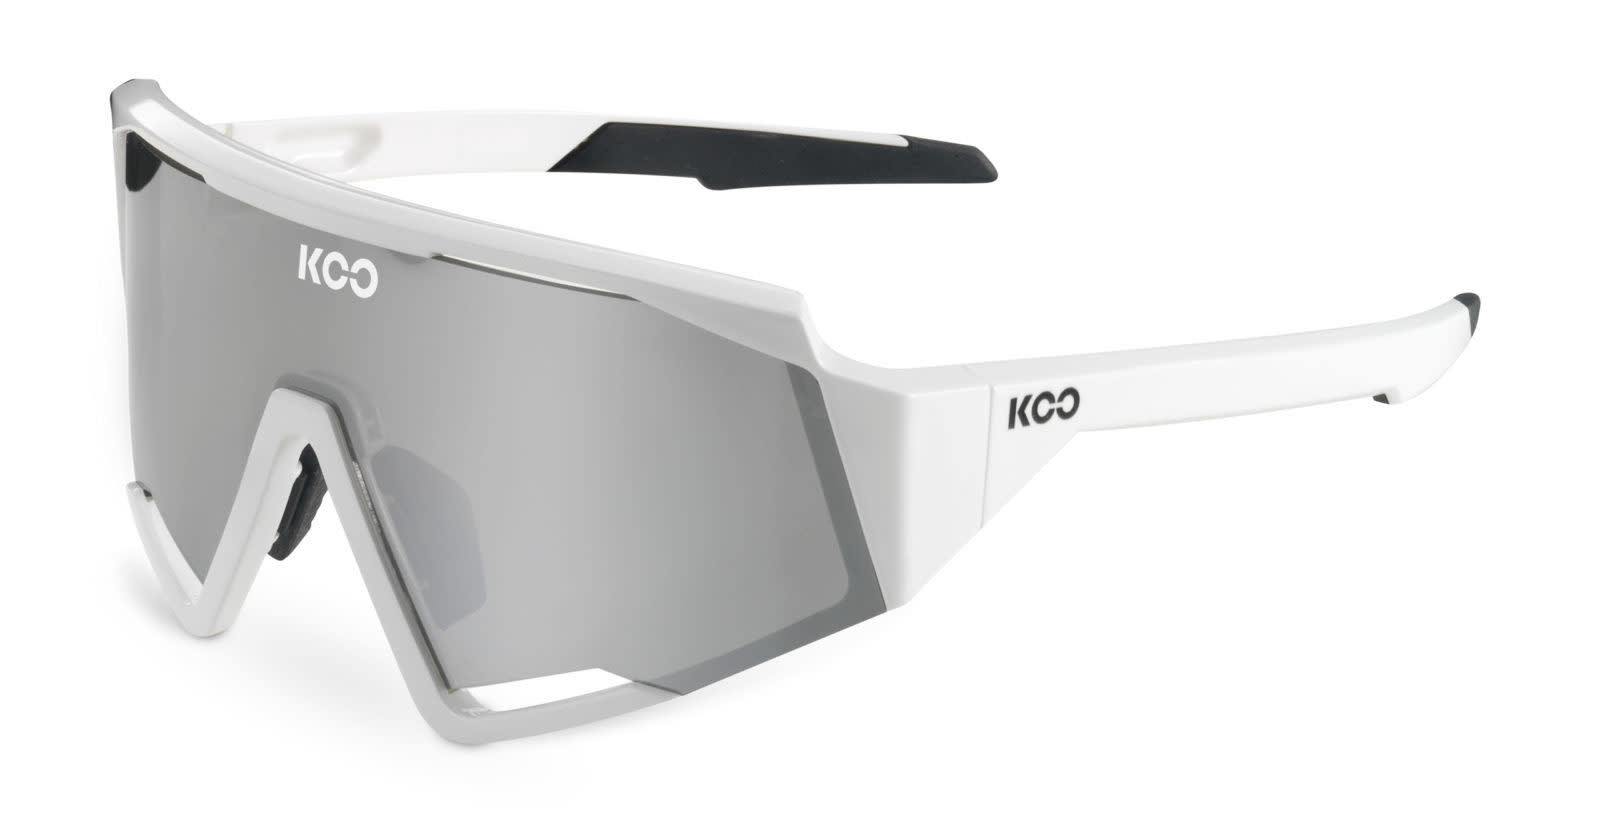 Koo KOO Spectro White/Silver  Lense Super Silver mirror